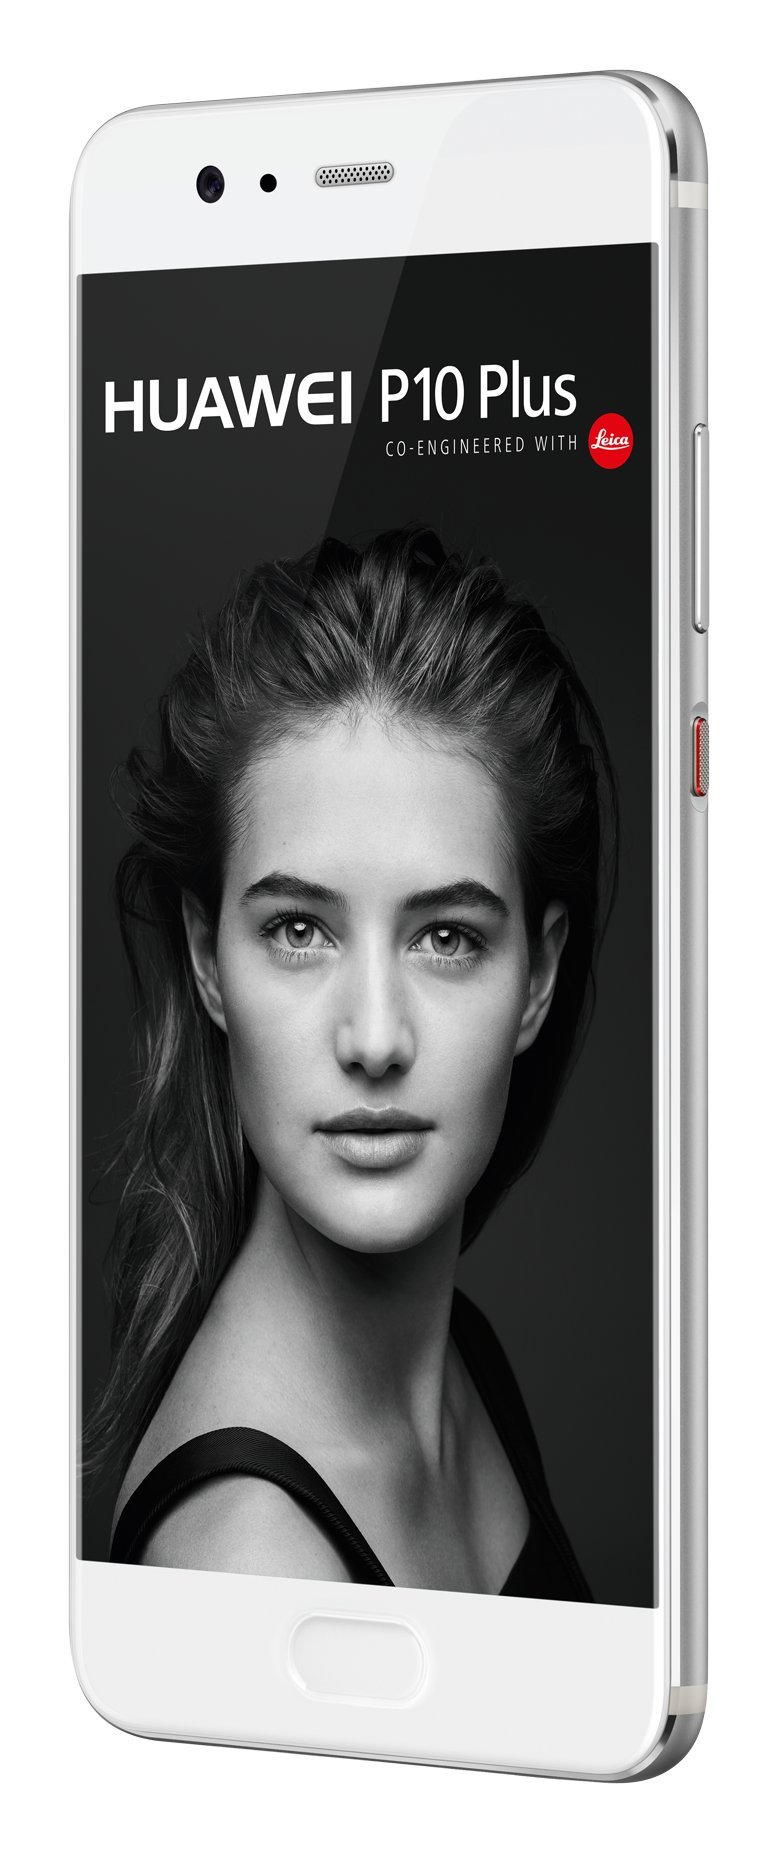 Móvil Huawei P10 Plus - Plata: Amazon.es: Electrónica